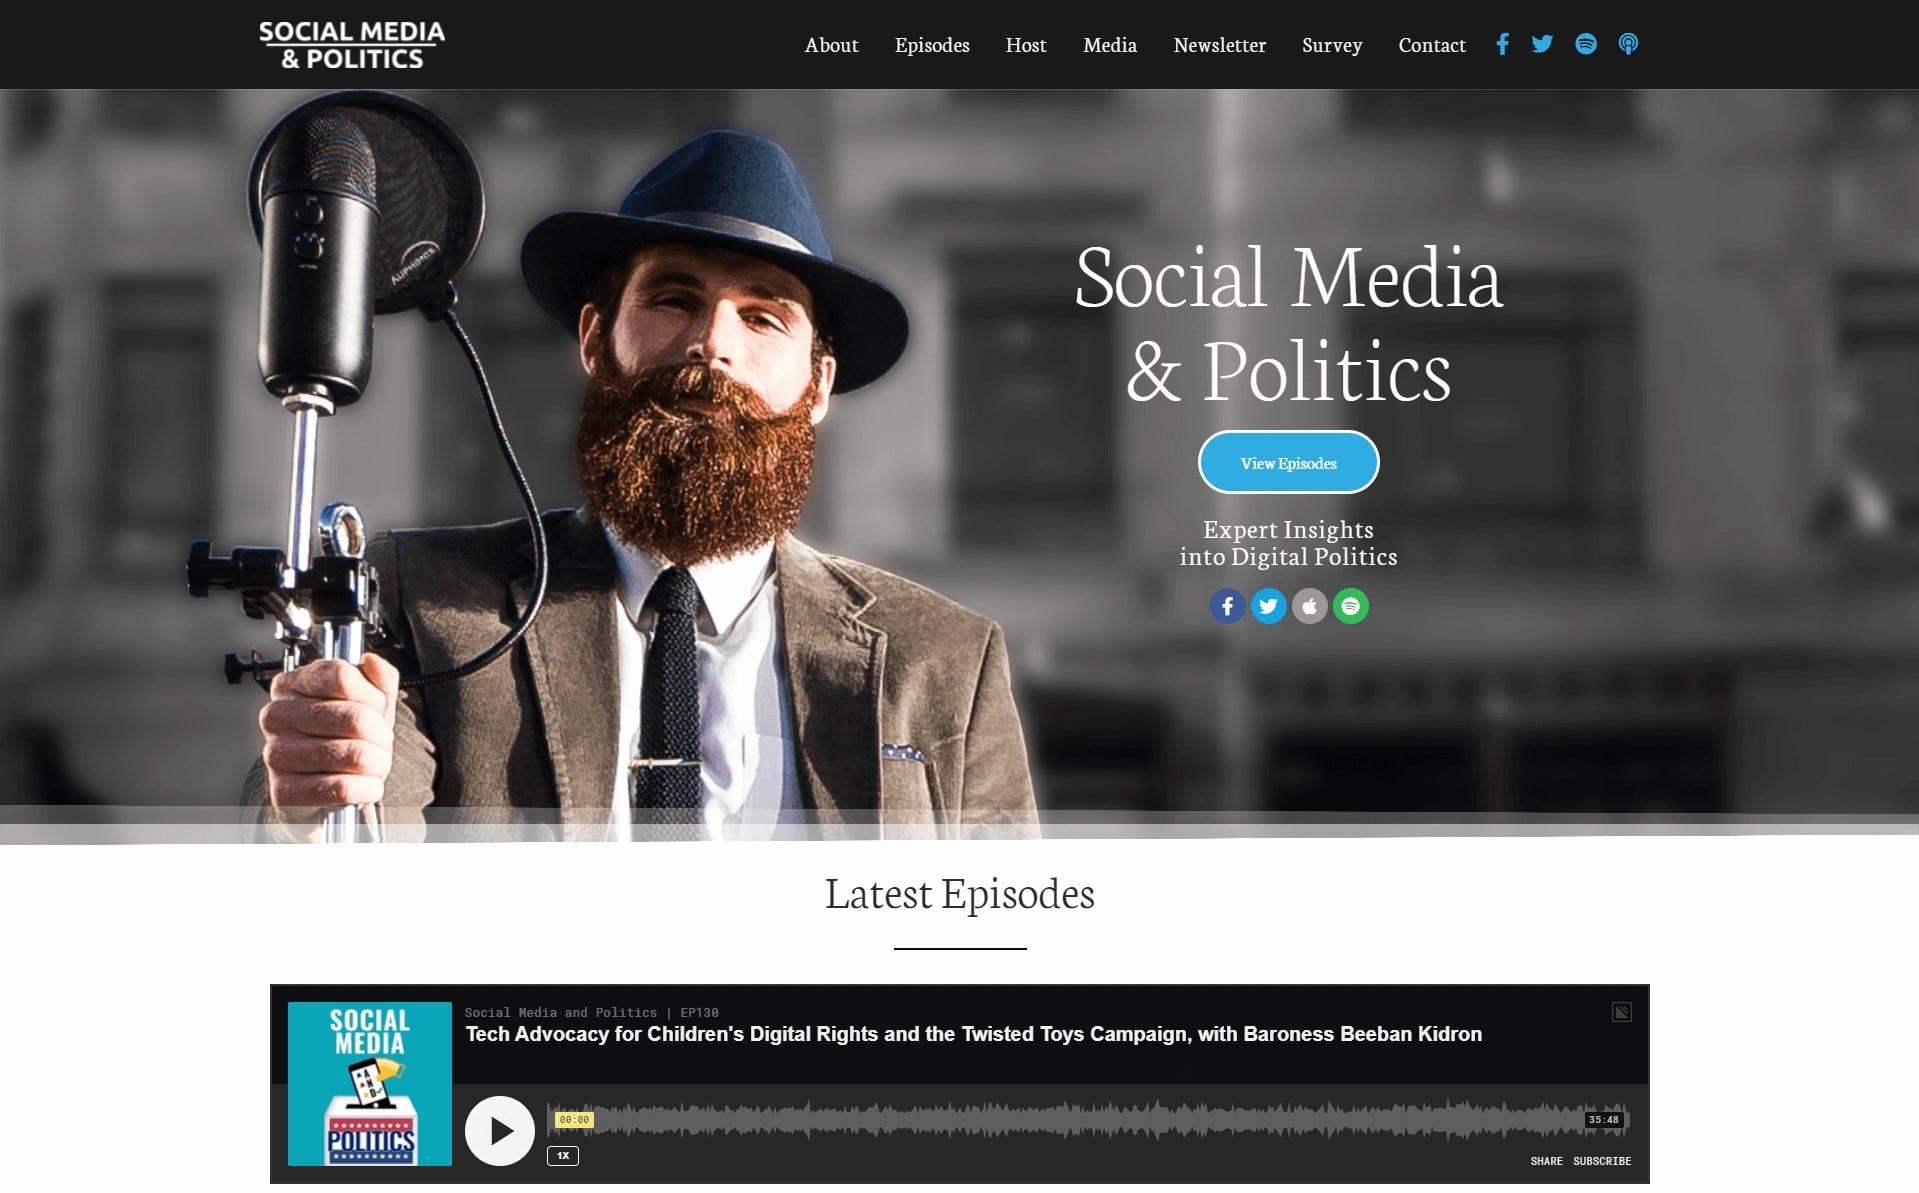 socia lmedia and politics landing page